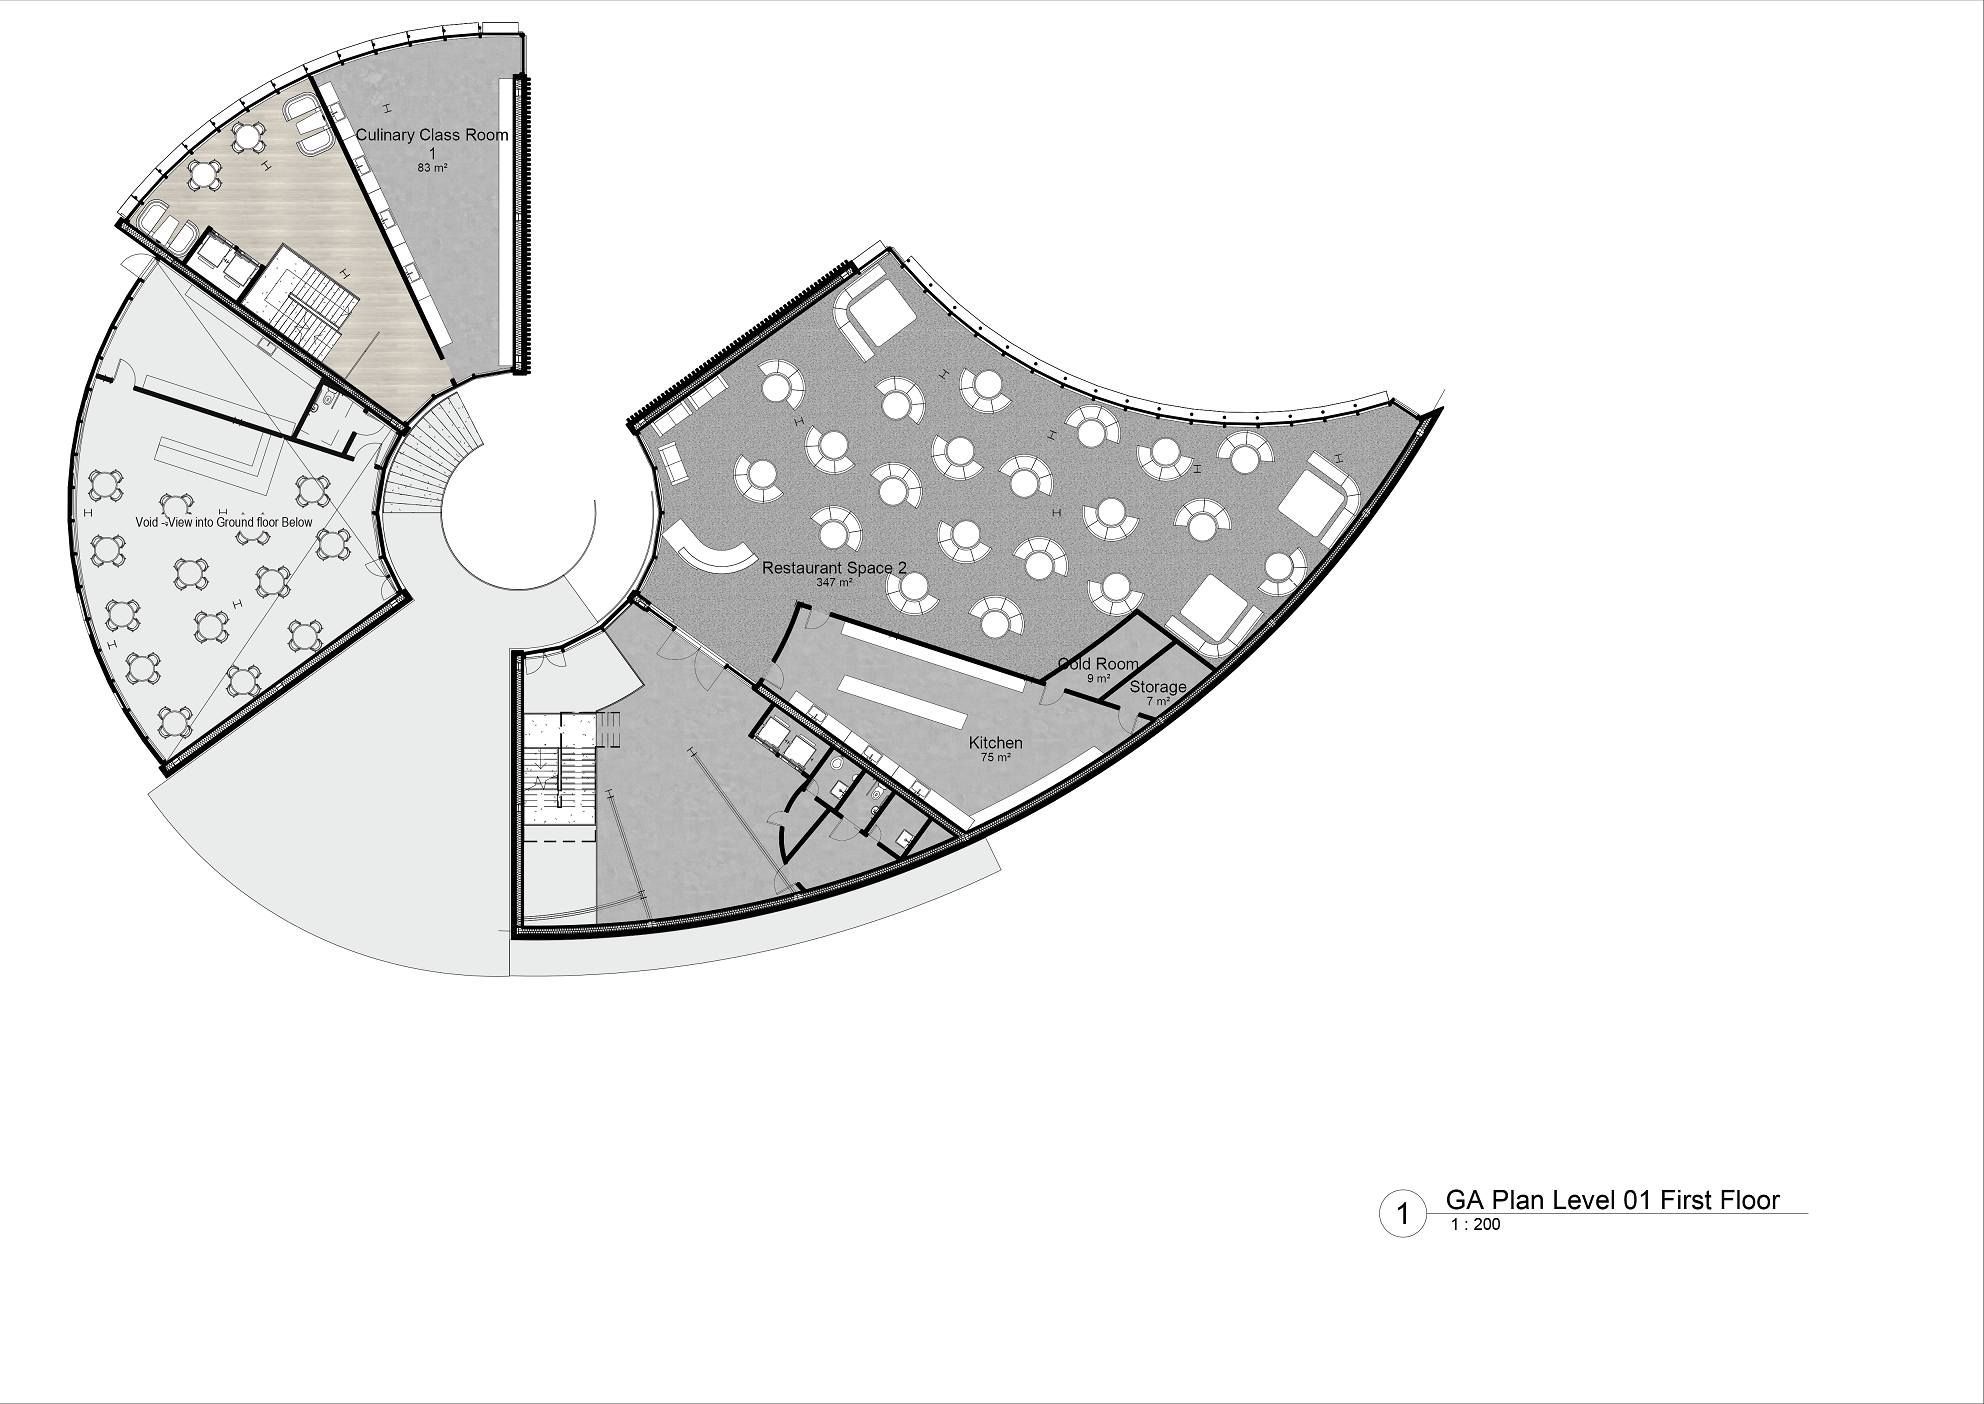 Culinary School first floor plan diagram